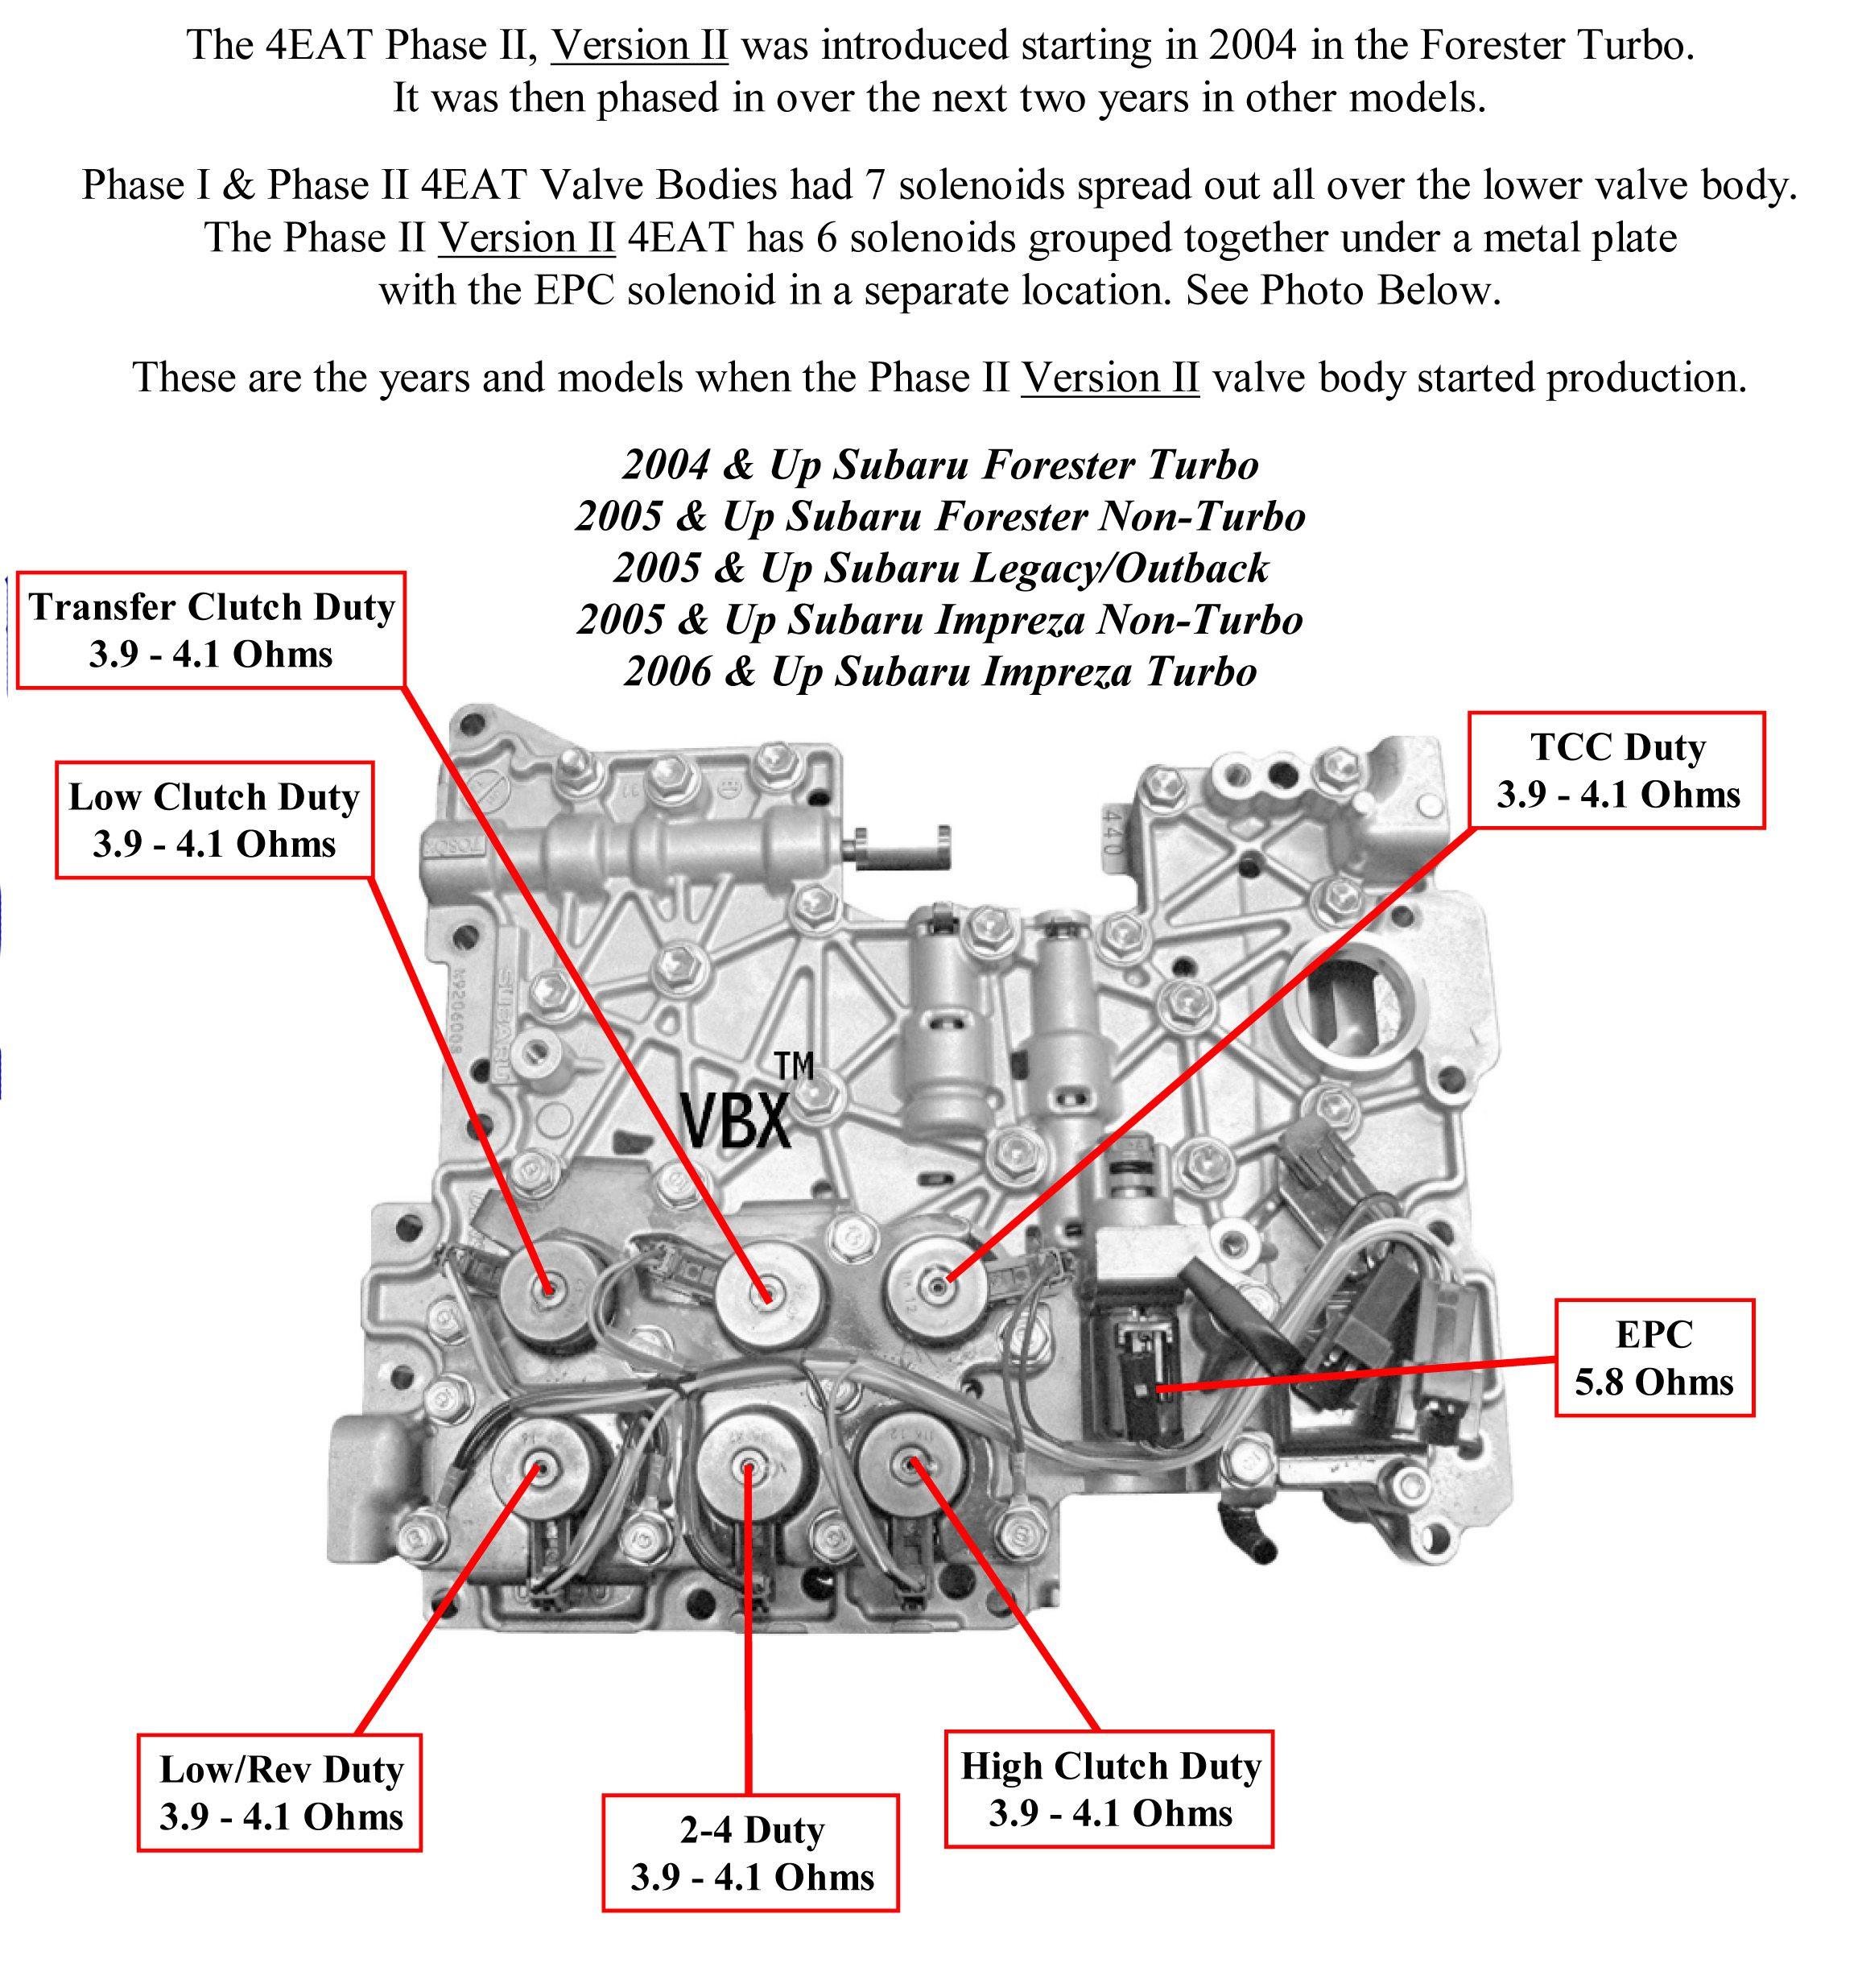 1993 Subaru 4eat Transmission Diagram Trusted Wiring Diagrams For Legacy Body Smart U2022 2002 Outback Manual